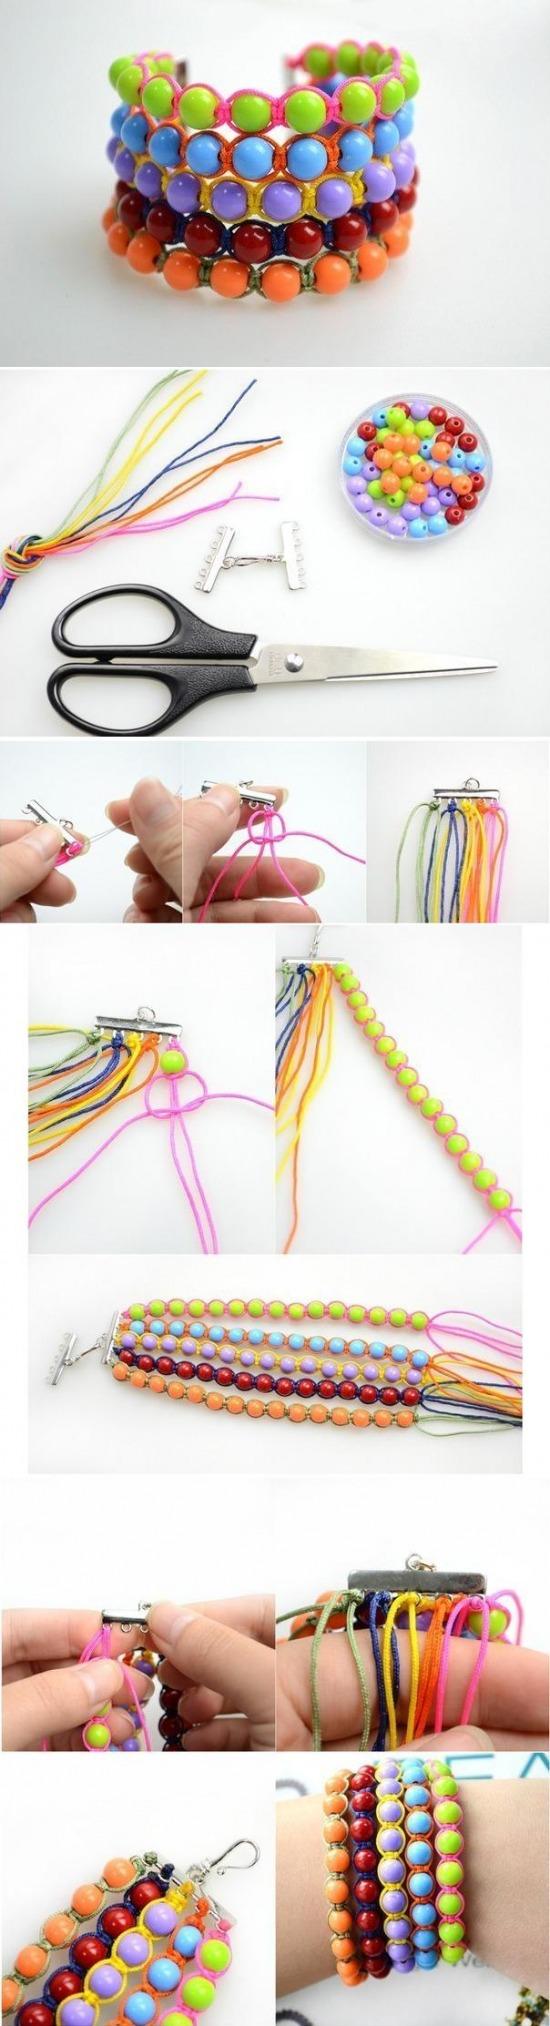 DIY-Quick-Beads-Bracelet.jpg